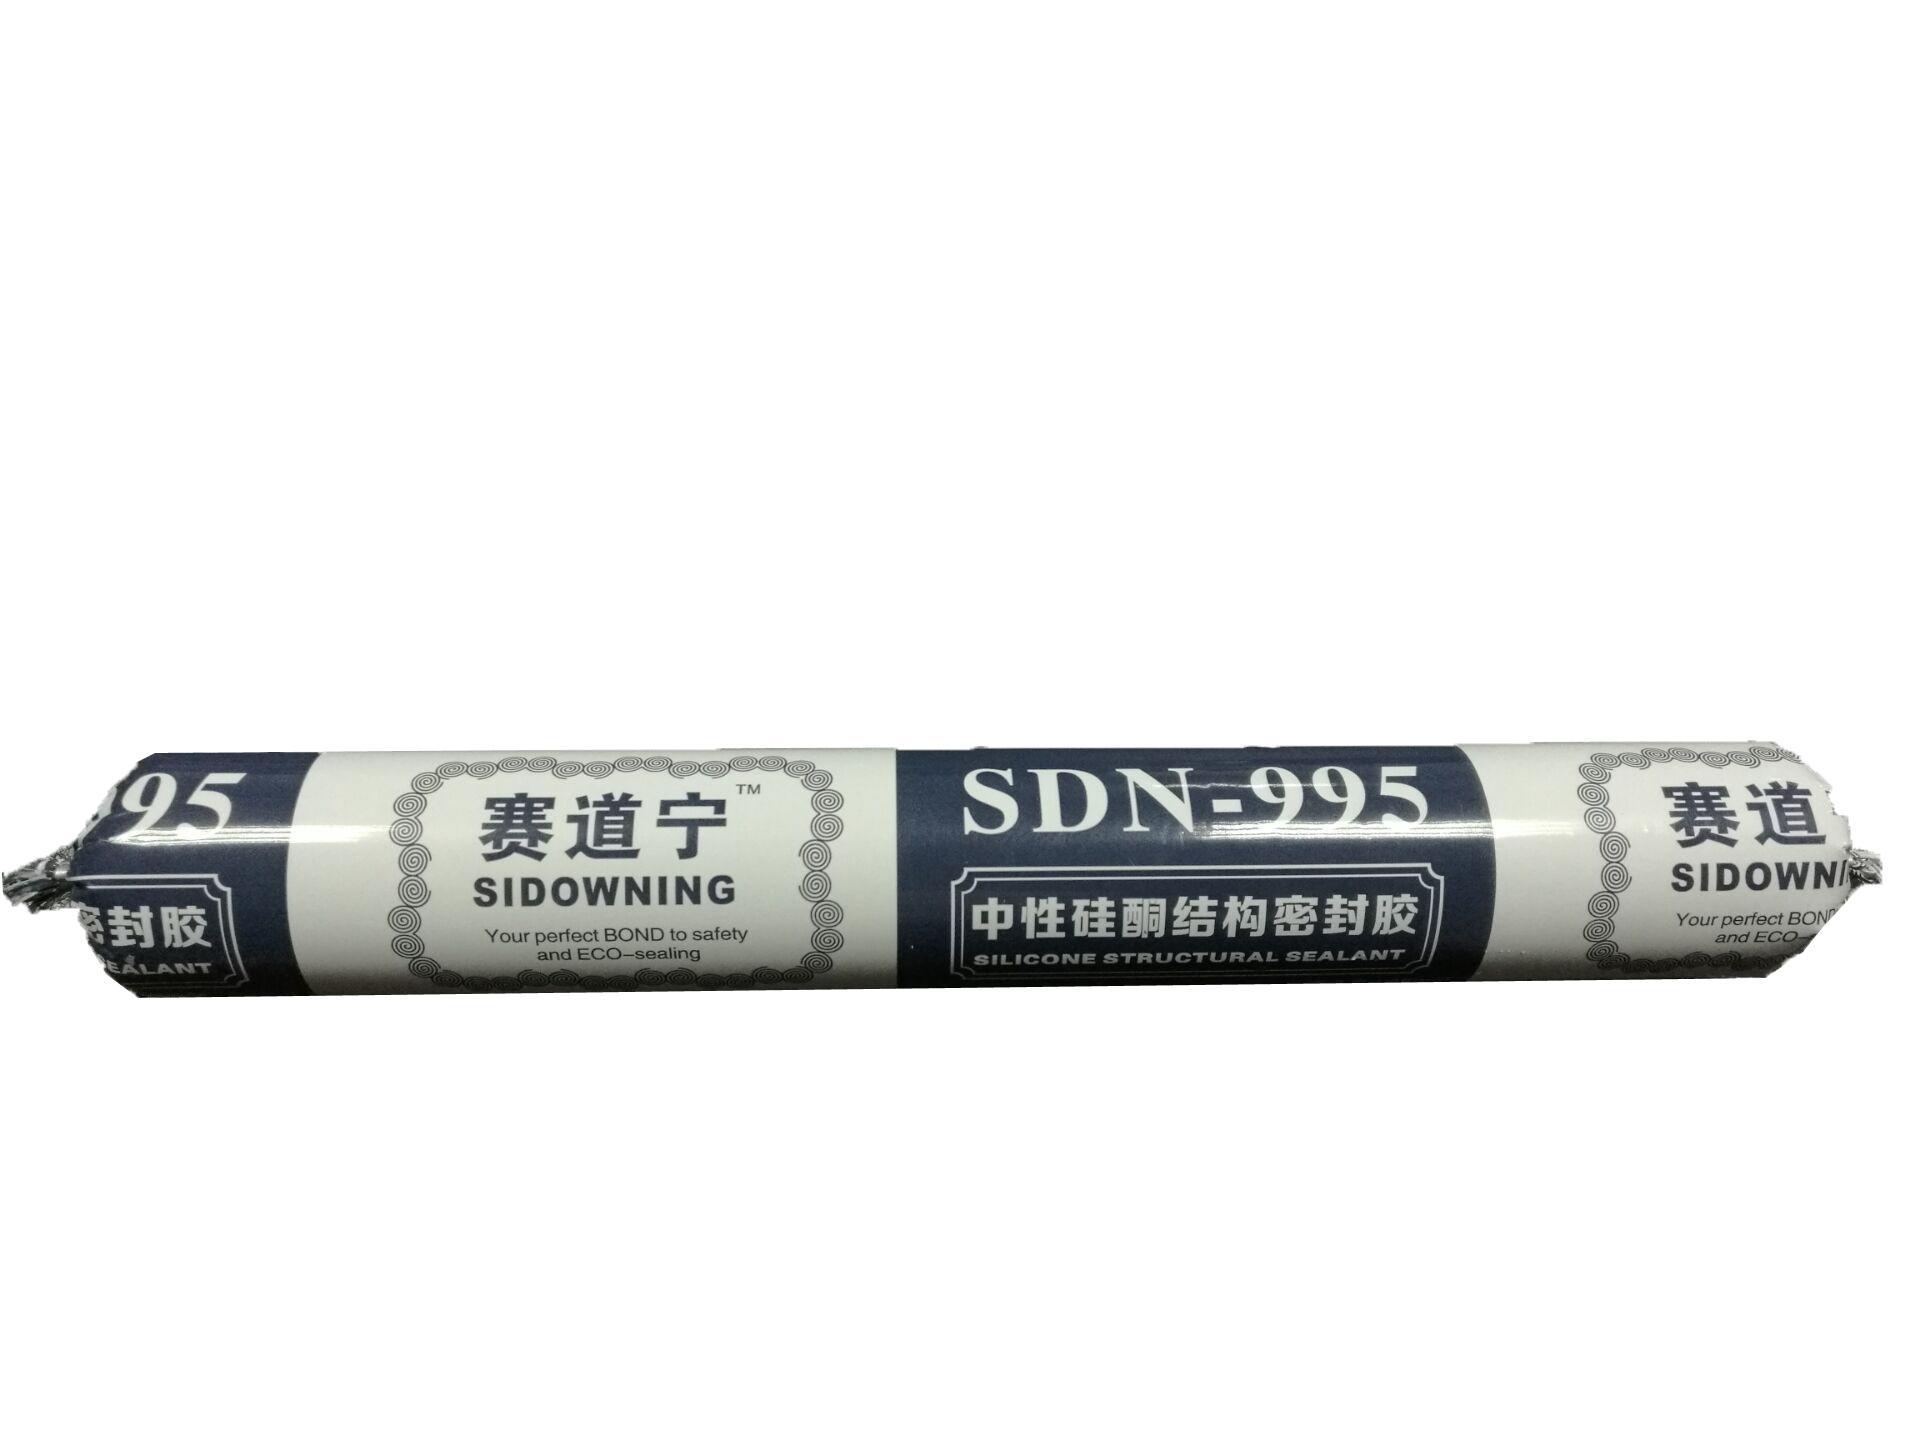 SINO-BOND SND995 SILICONE SEALANT FOR WINDOWS & DOORS